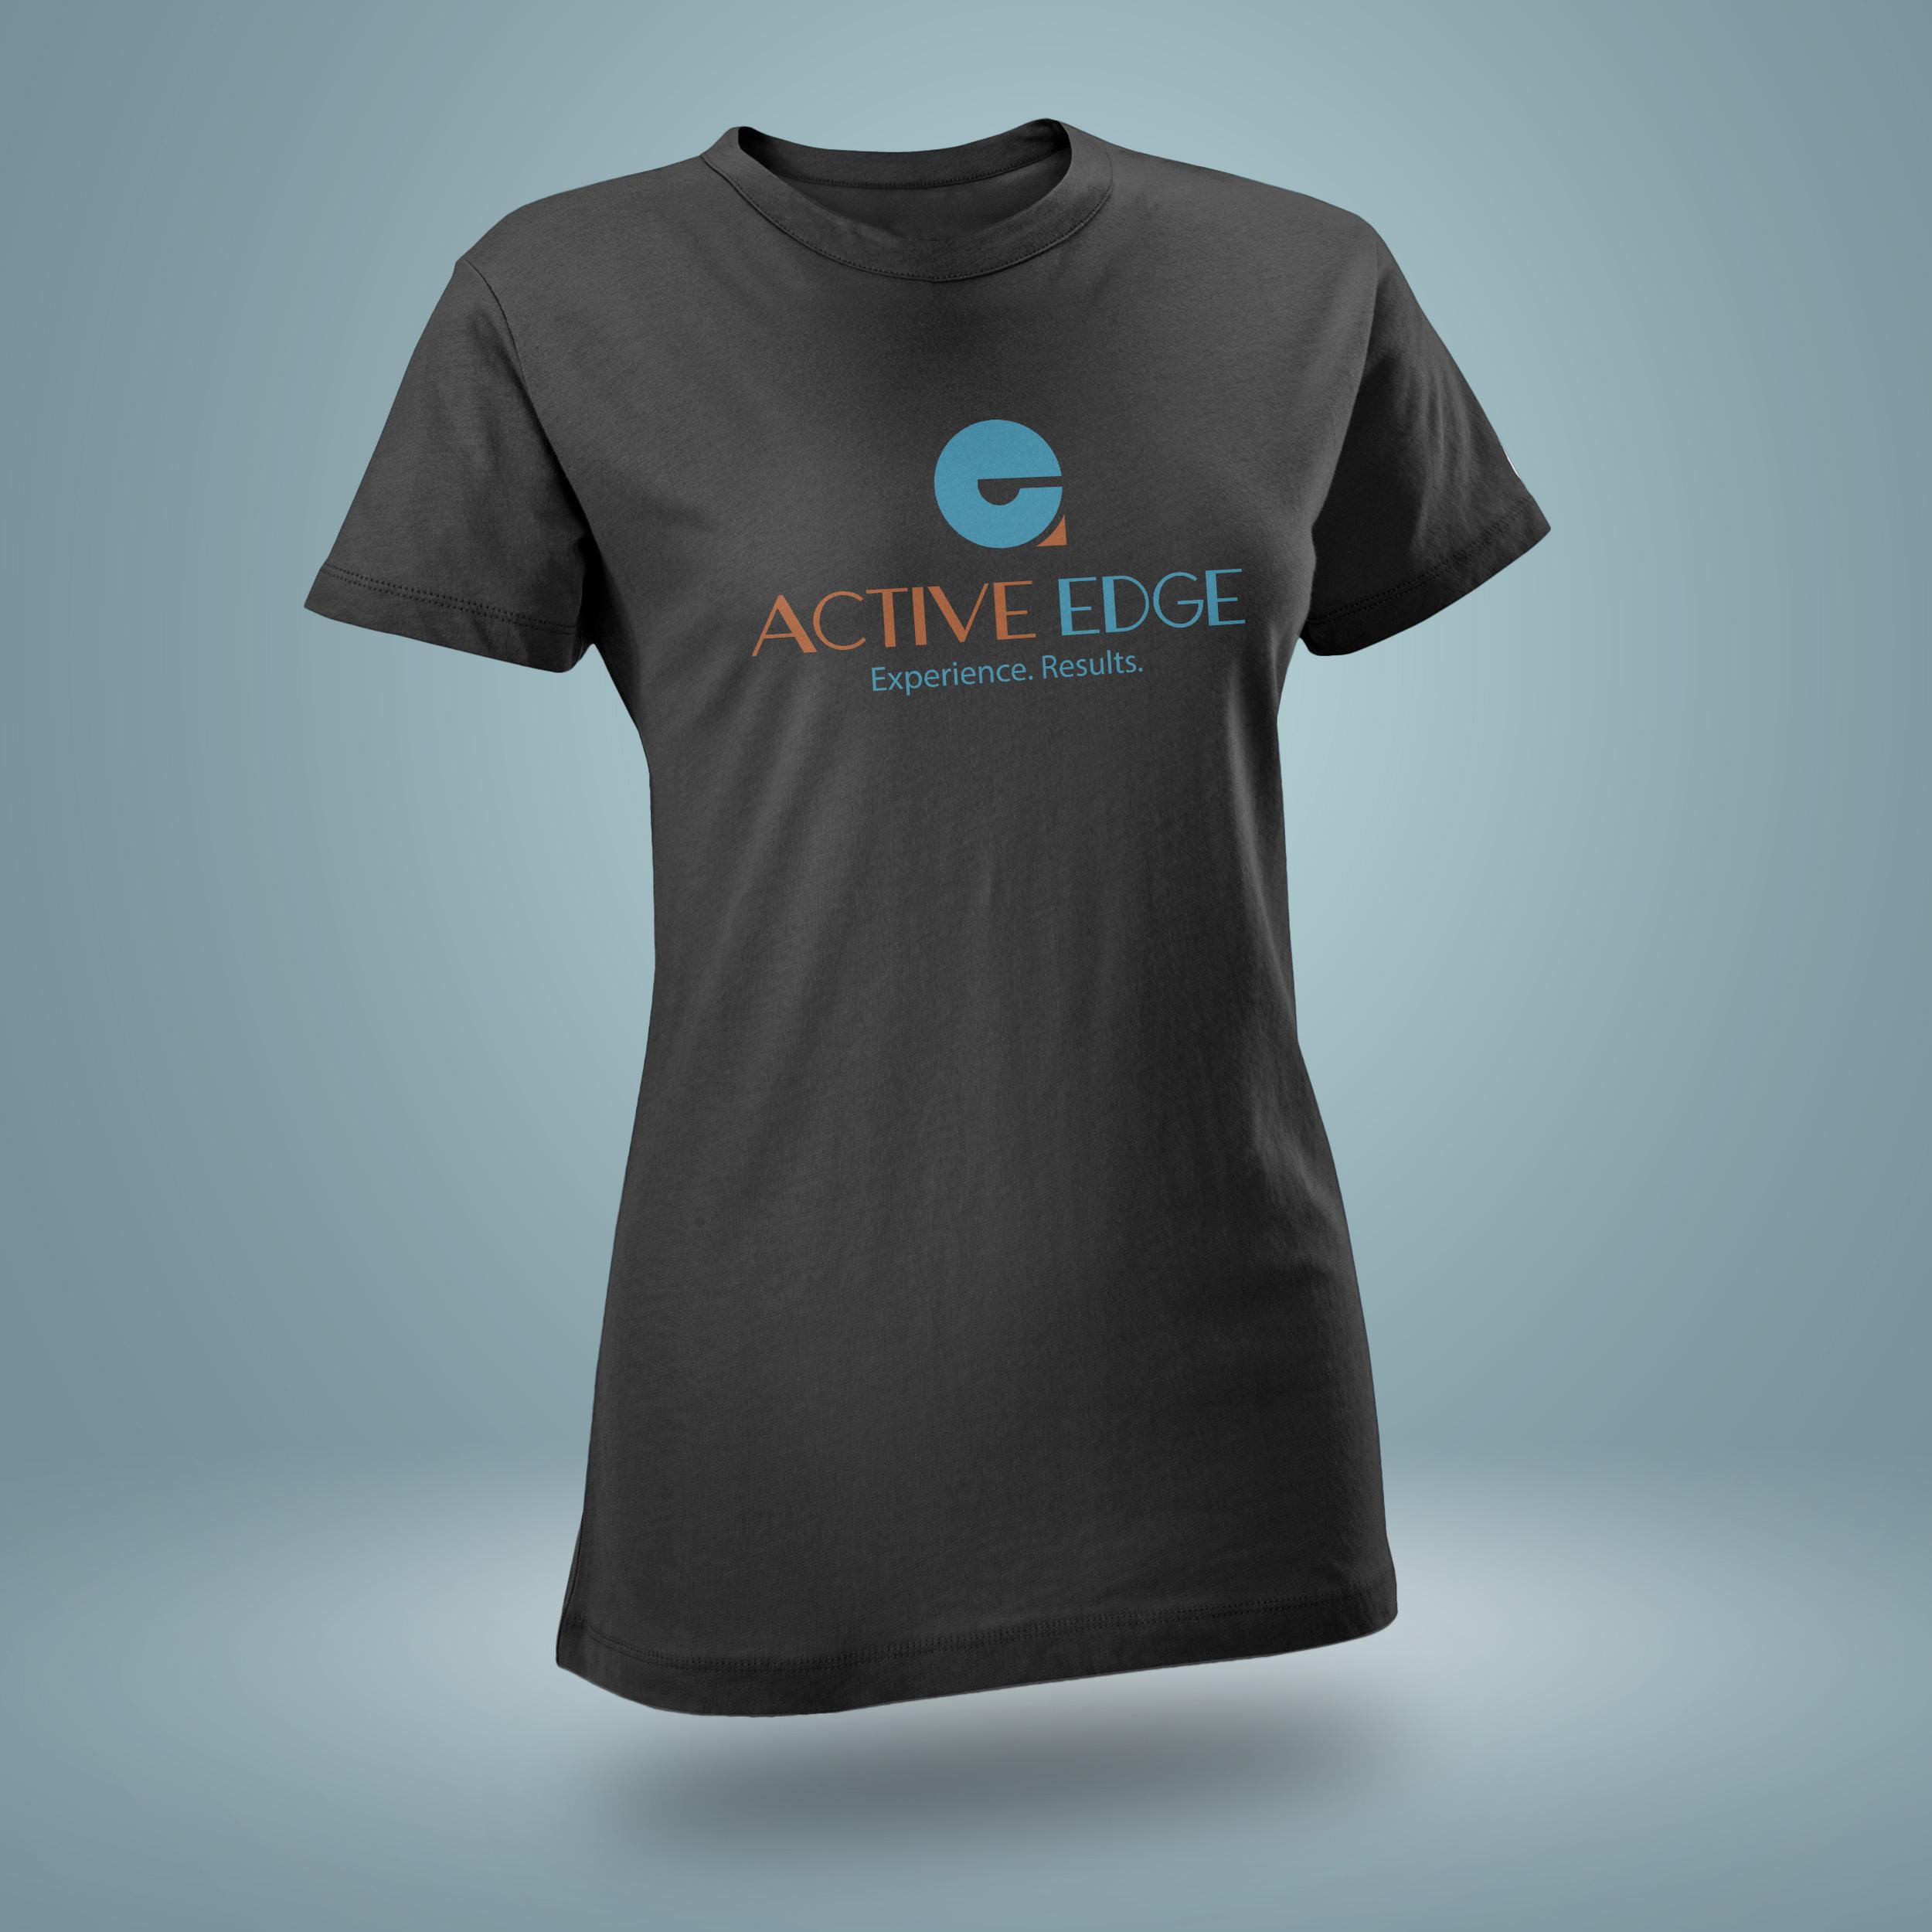 T-shirt mockup - Active Edge